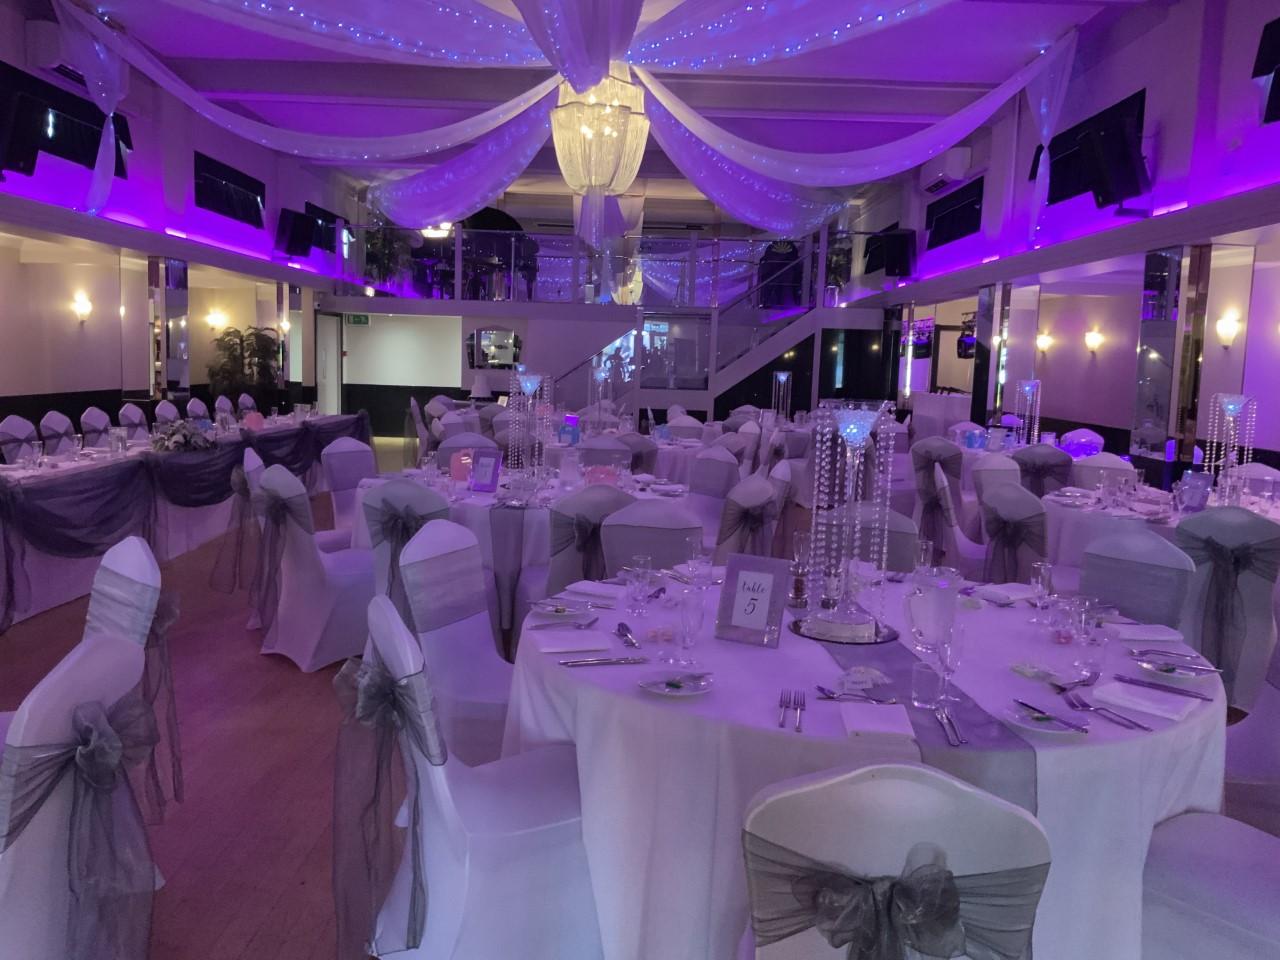 Ballroom - Rosie and Daniel's Wedding 24th August 2019 - Arlington Ballroom Southend